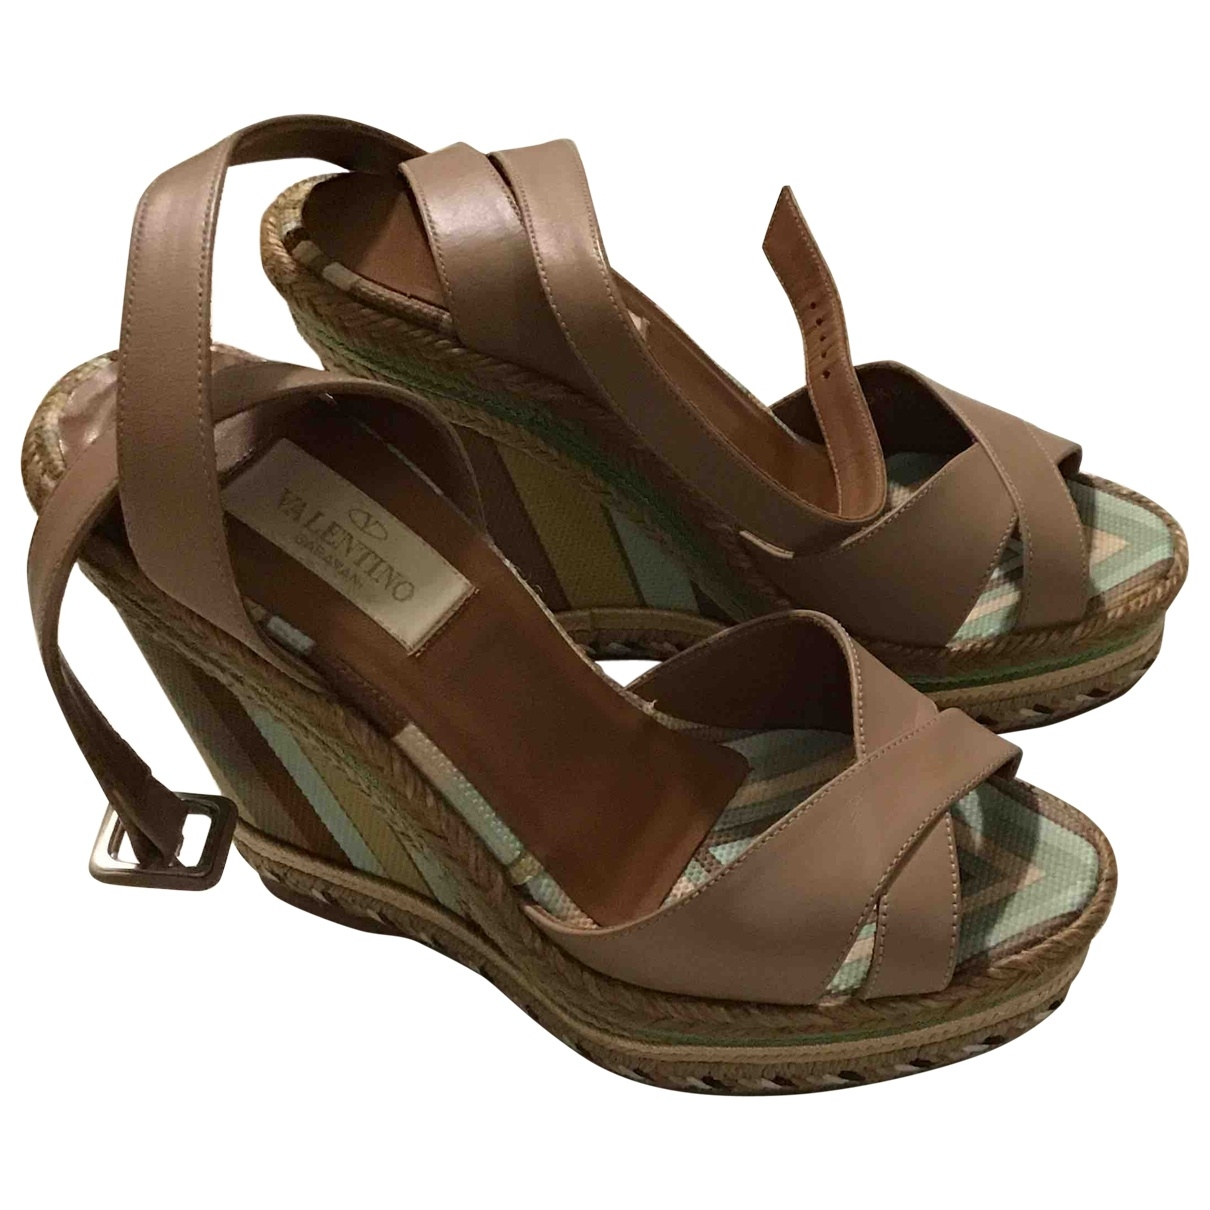 Valentino Garavani \N Camel Leather Sandals for Women 35 EU